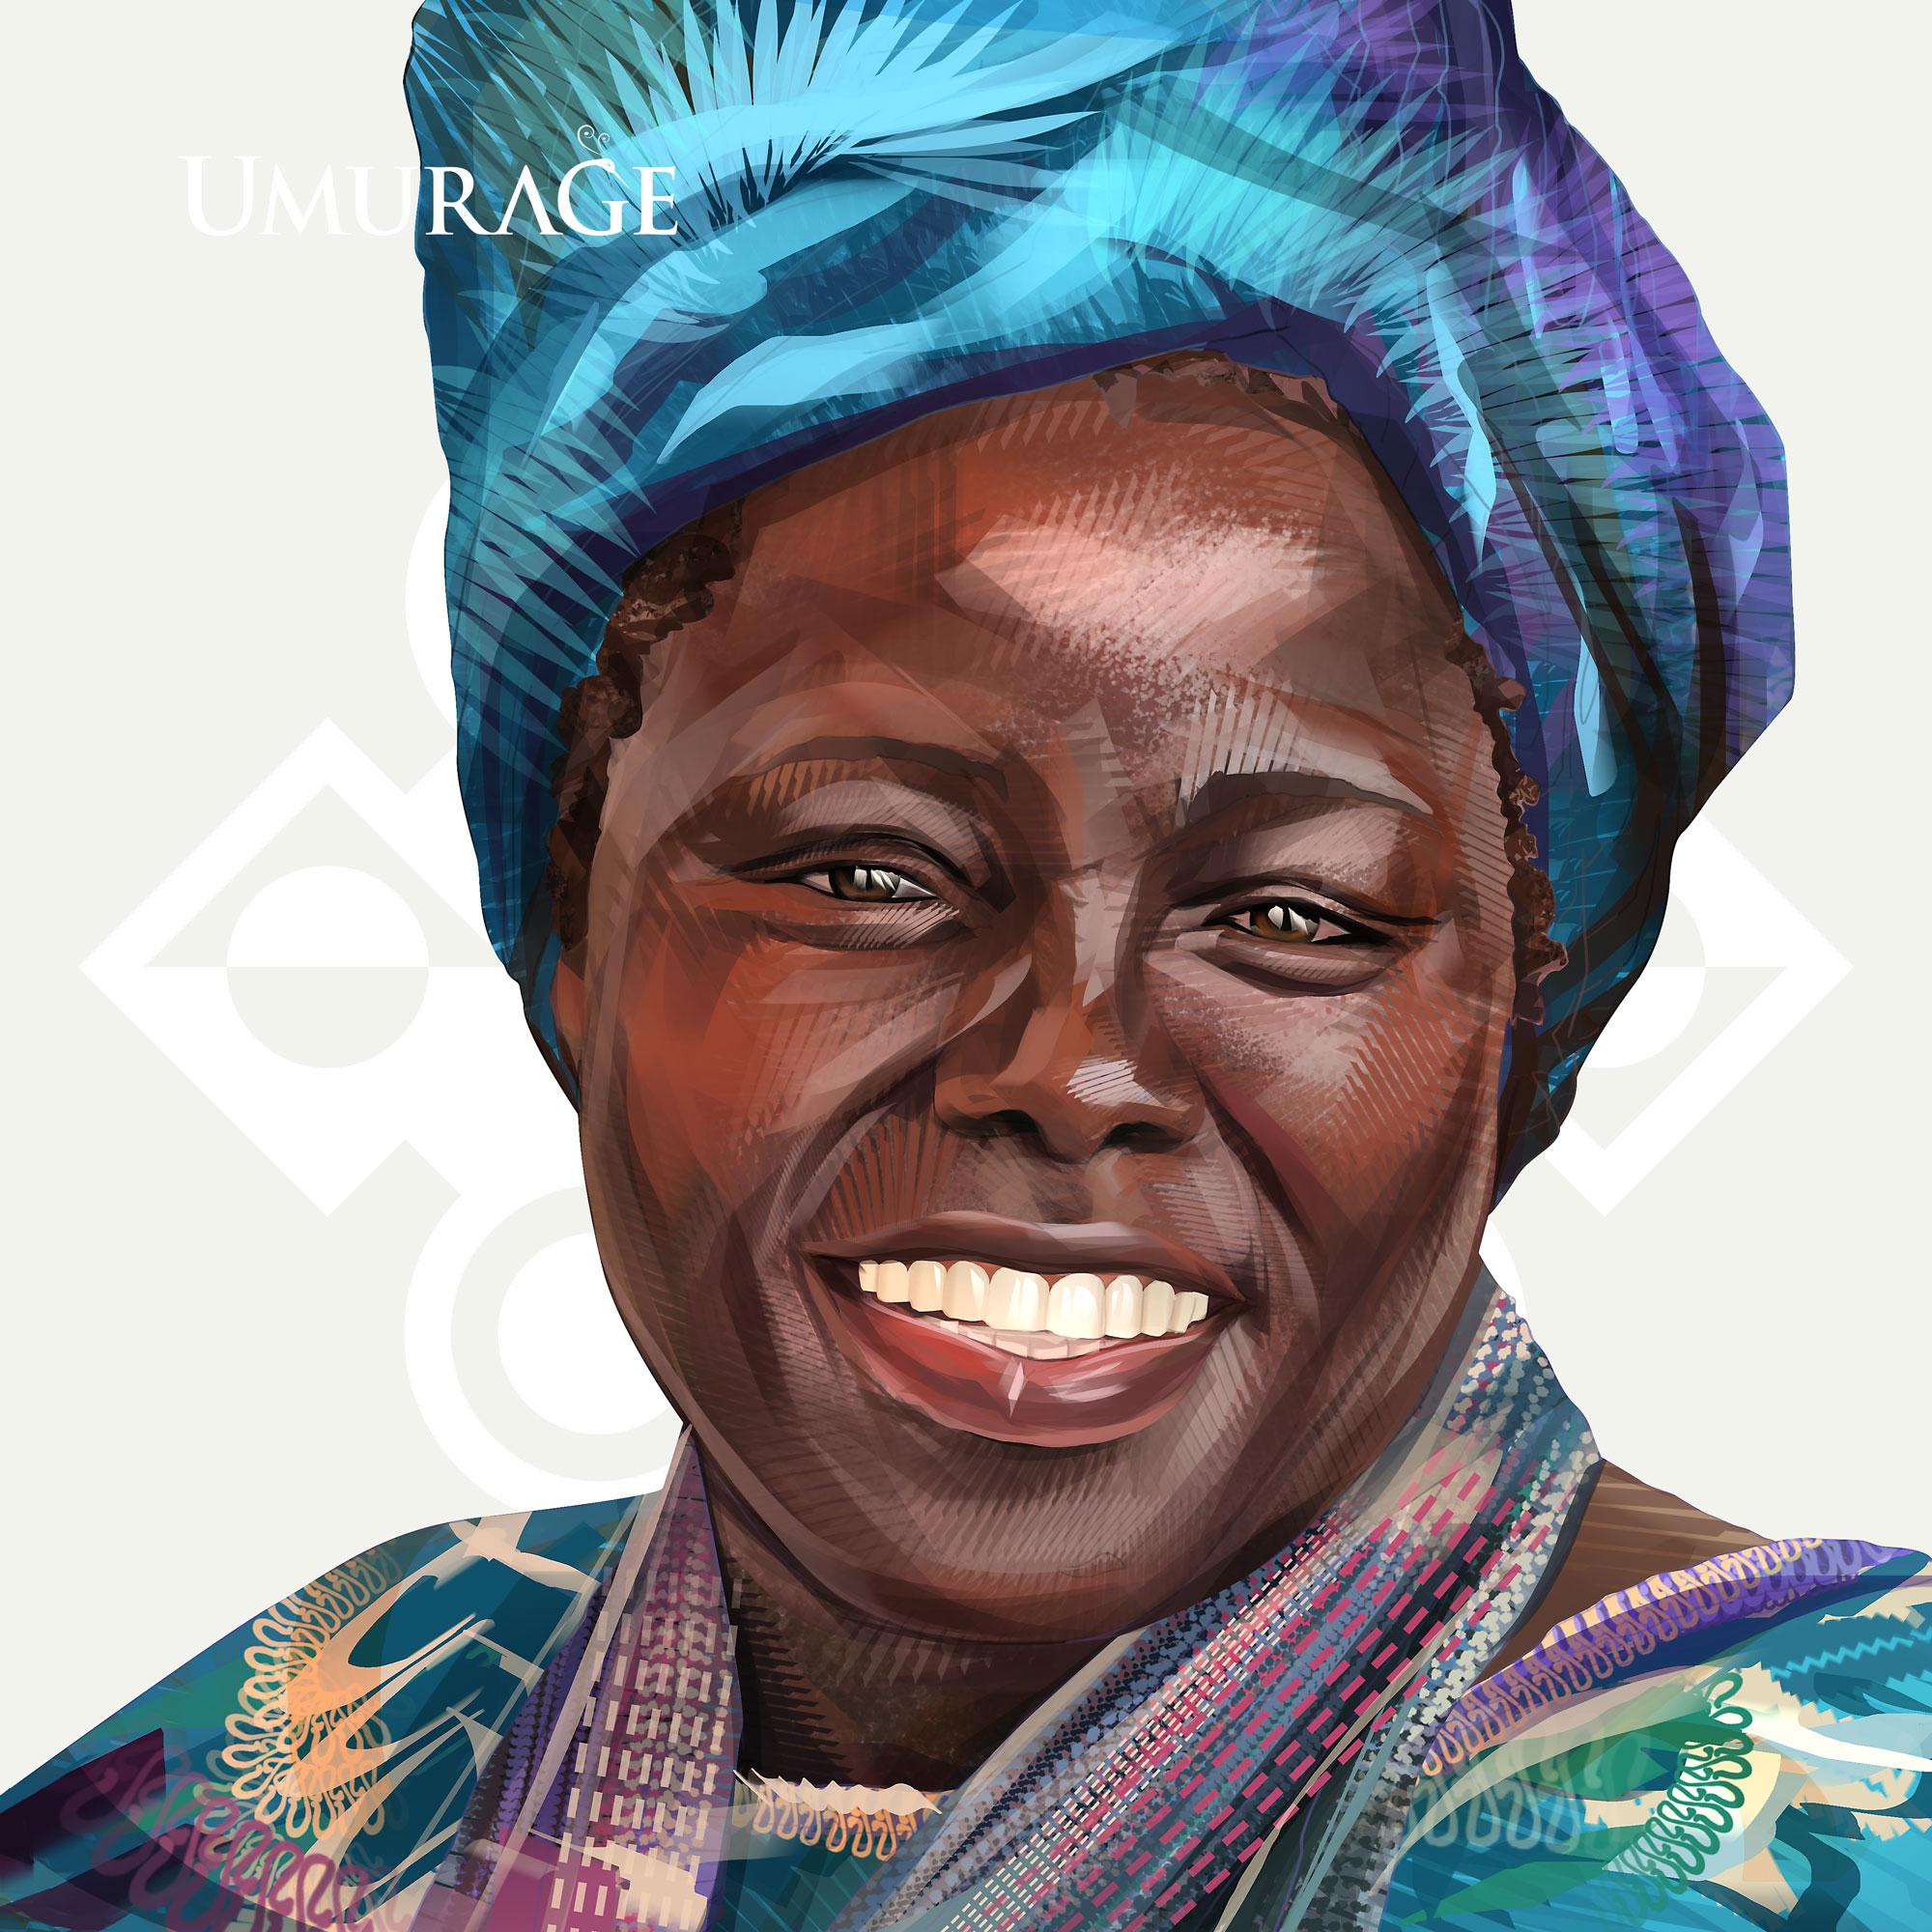 UMURAGE_LL_WangariMaathai_KENYA_WEB.jpg